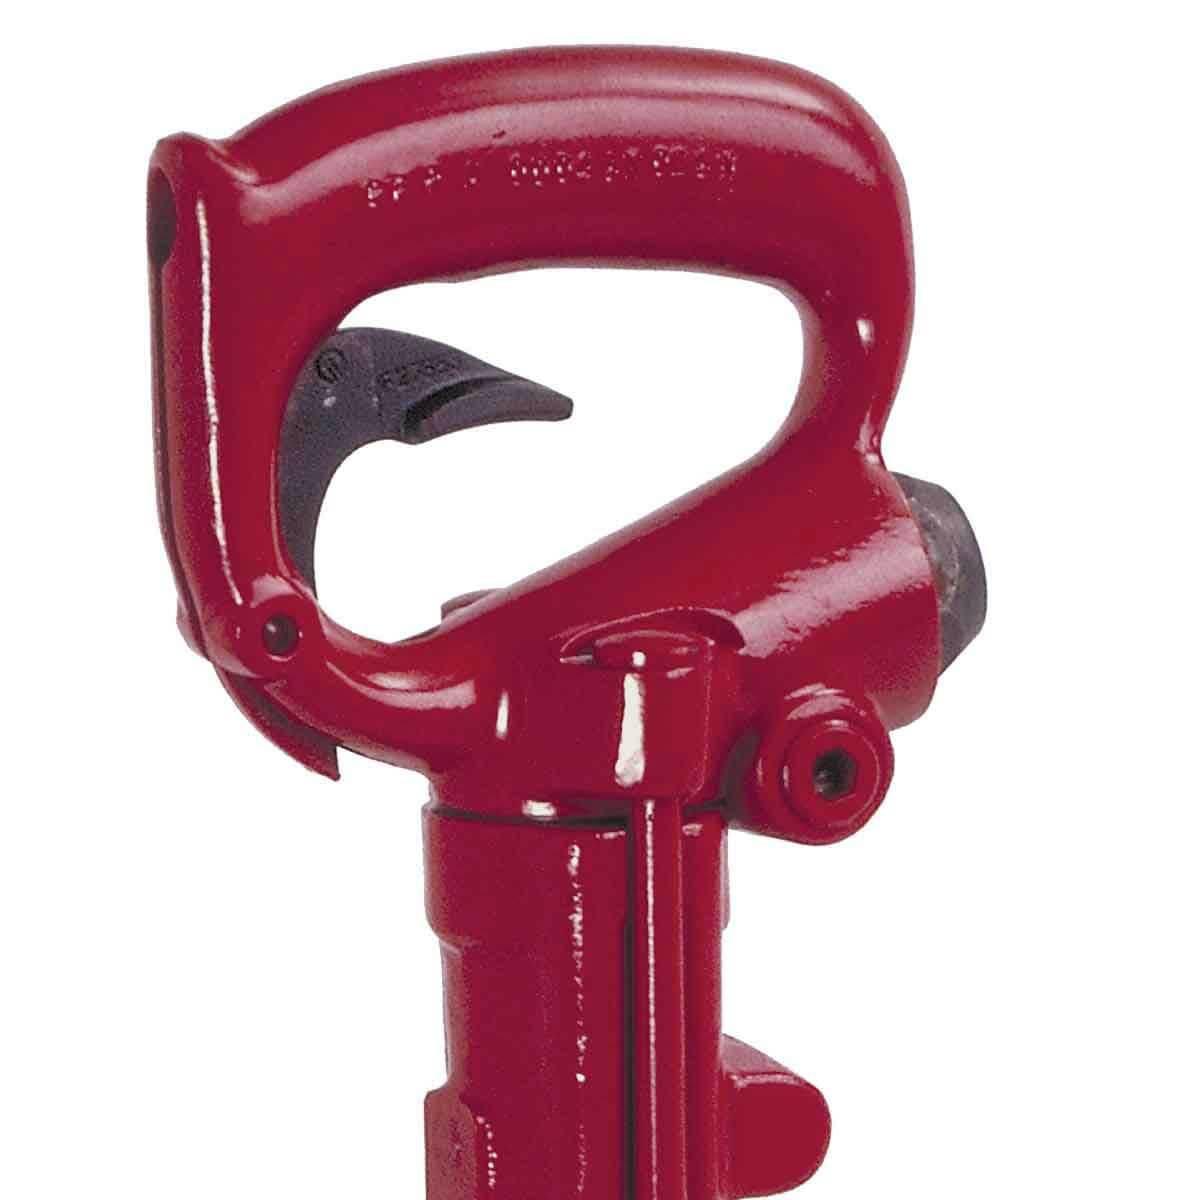 Chicago Pneumatic Combi Drill Hammer